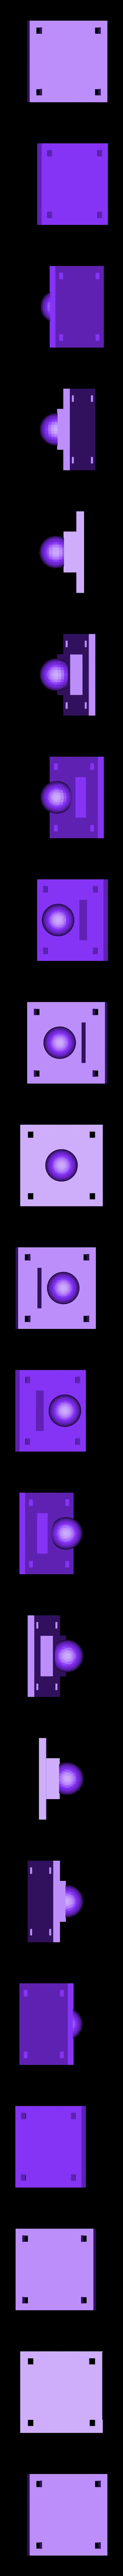 bouchon.stl Download STL file Wall light • 3D printable design, bigoudi03